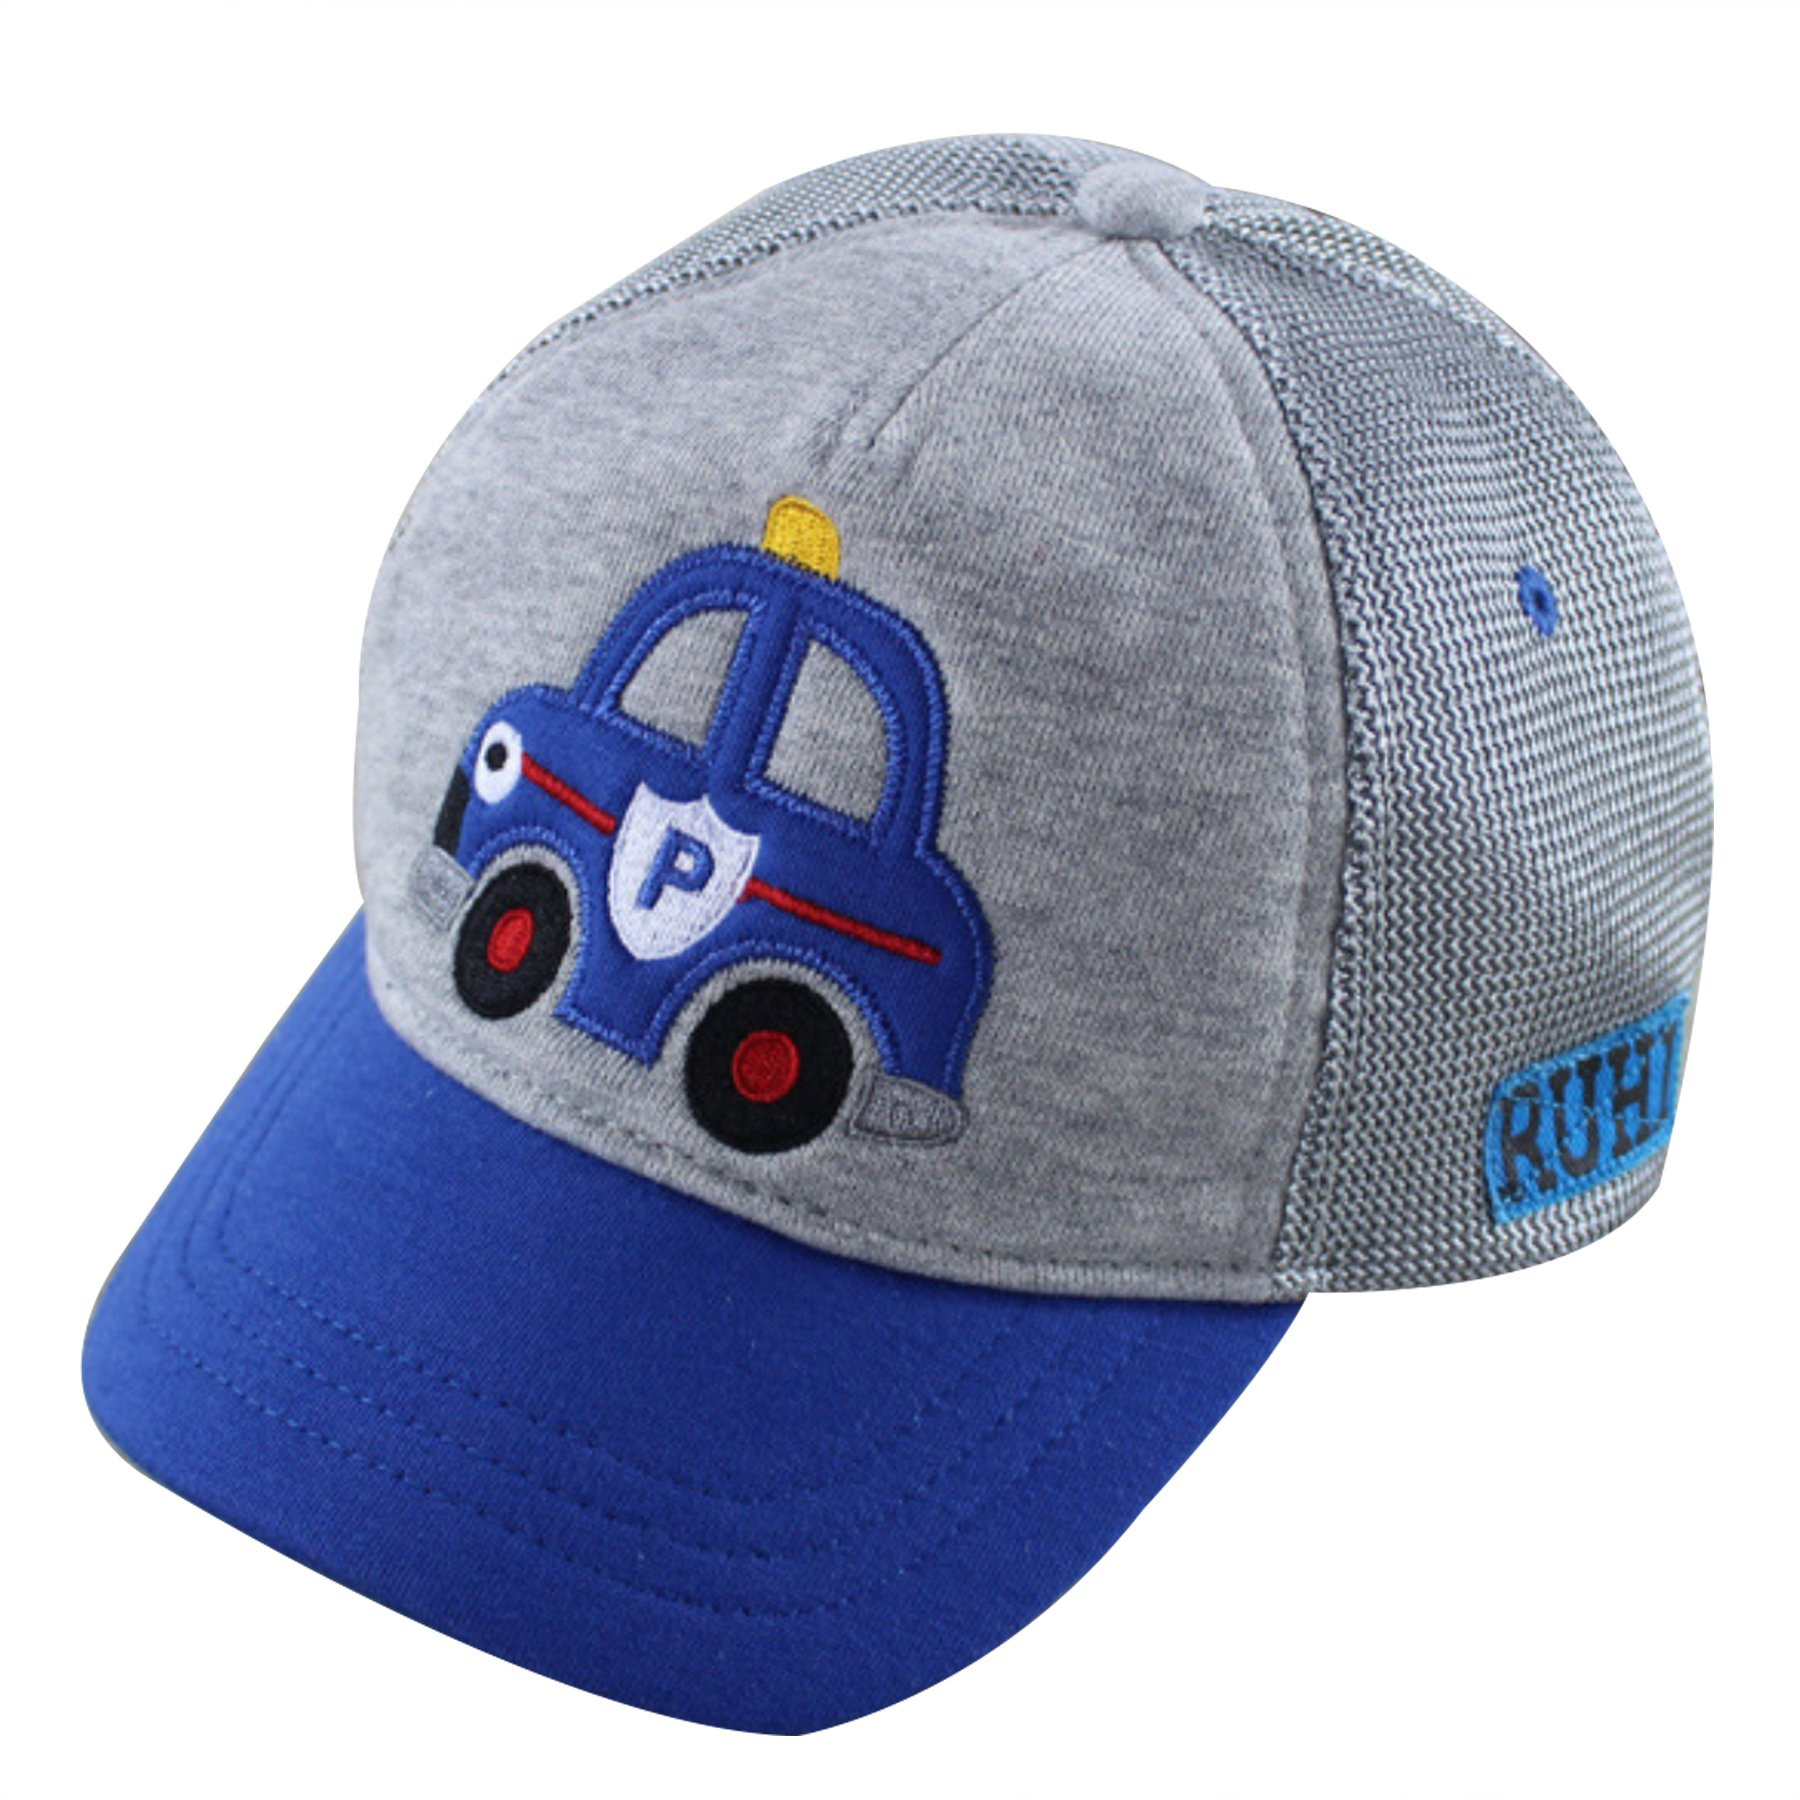 Home Prefer Toddler Boys Baseball Caps UV Sun Protection Hats Airy Mesh Sun Hat Gray XL